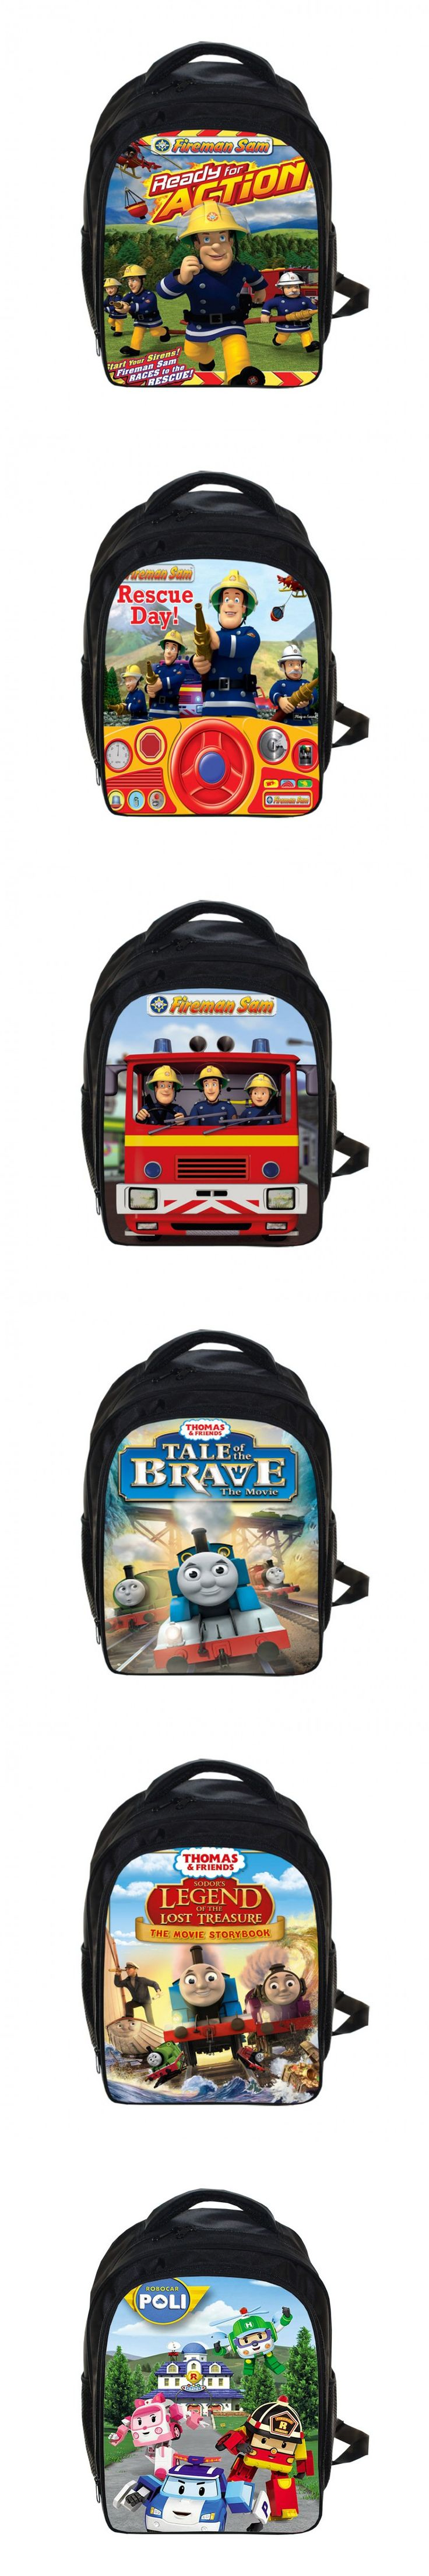 Cartoon Fireman Sam Backpack Thomas And Friends / Robocar Poli Backpack Children School Bags Kindergarten Backpacks Kids Bag